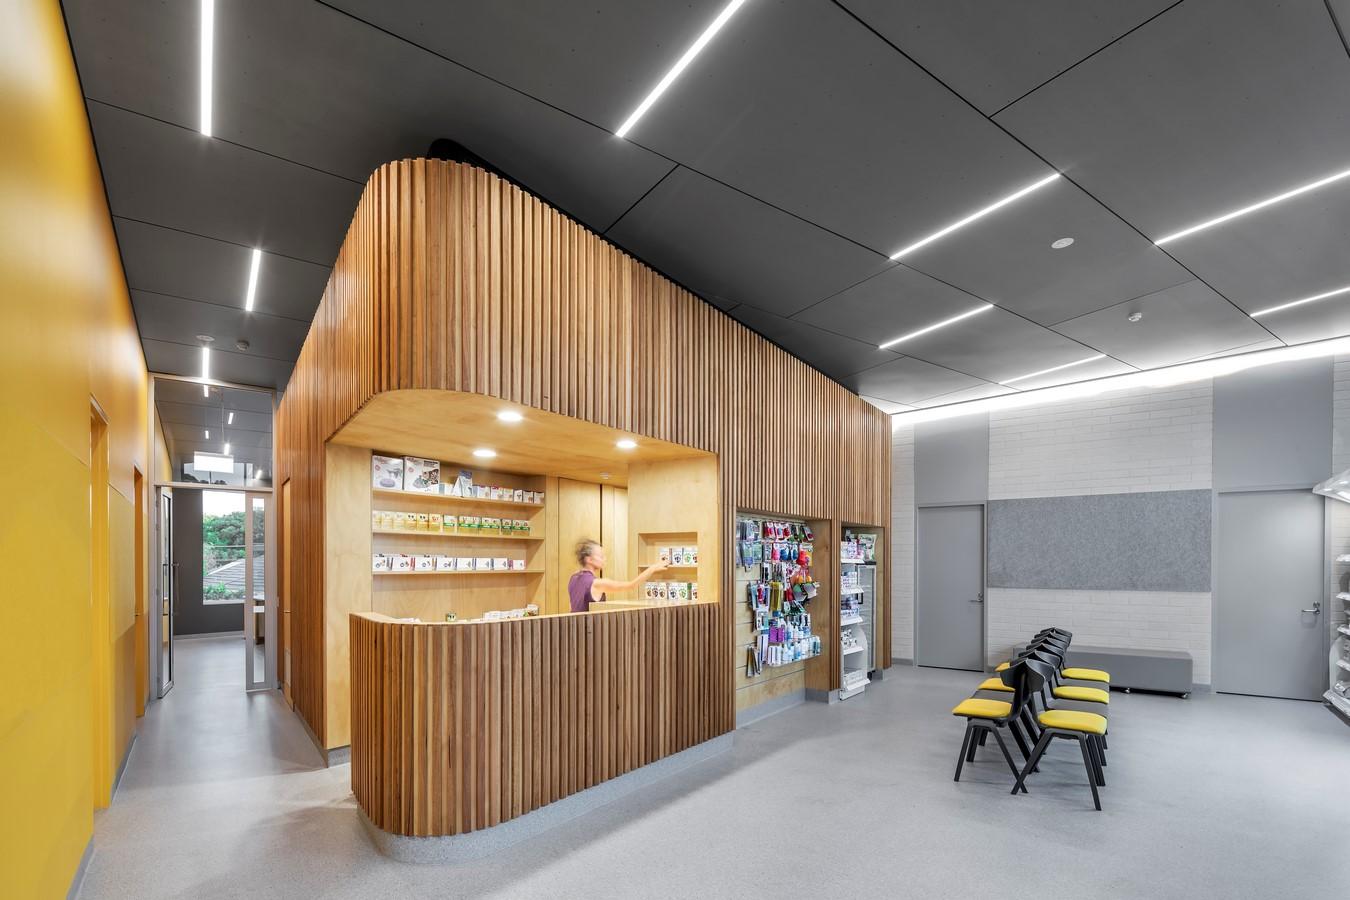 Walkerville Vet By Khab Architects - Sheet1